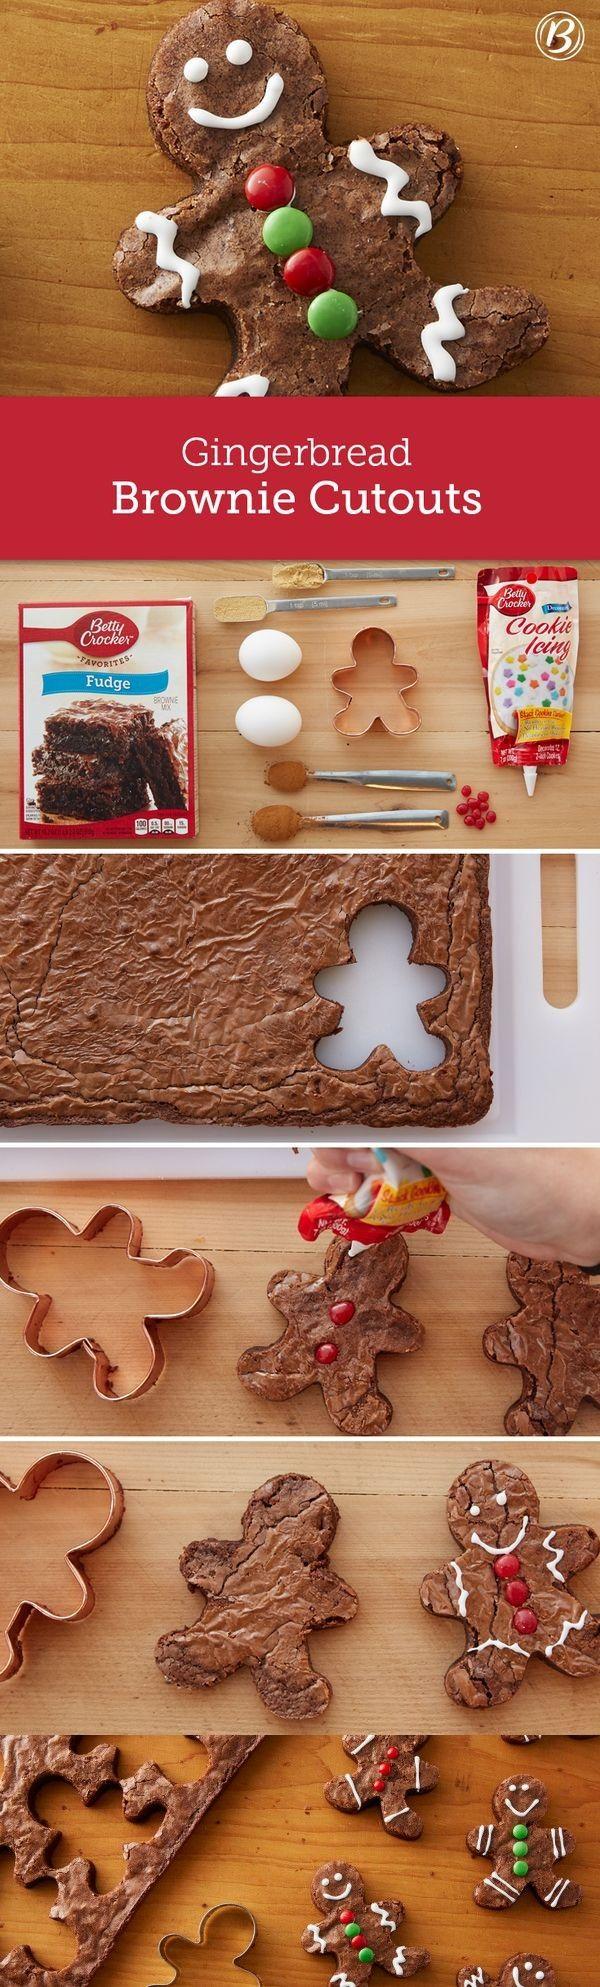 Gingerbread Brownie Cutouts